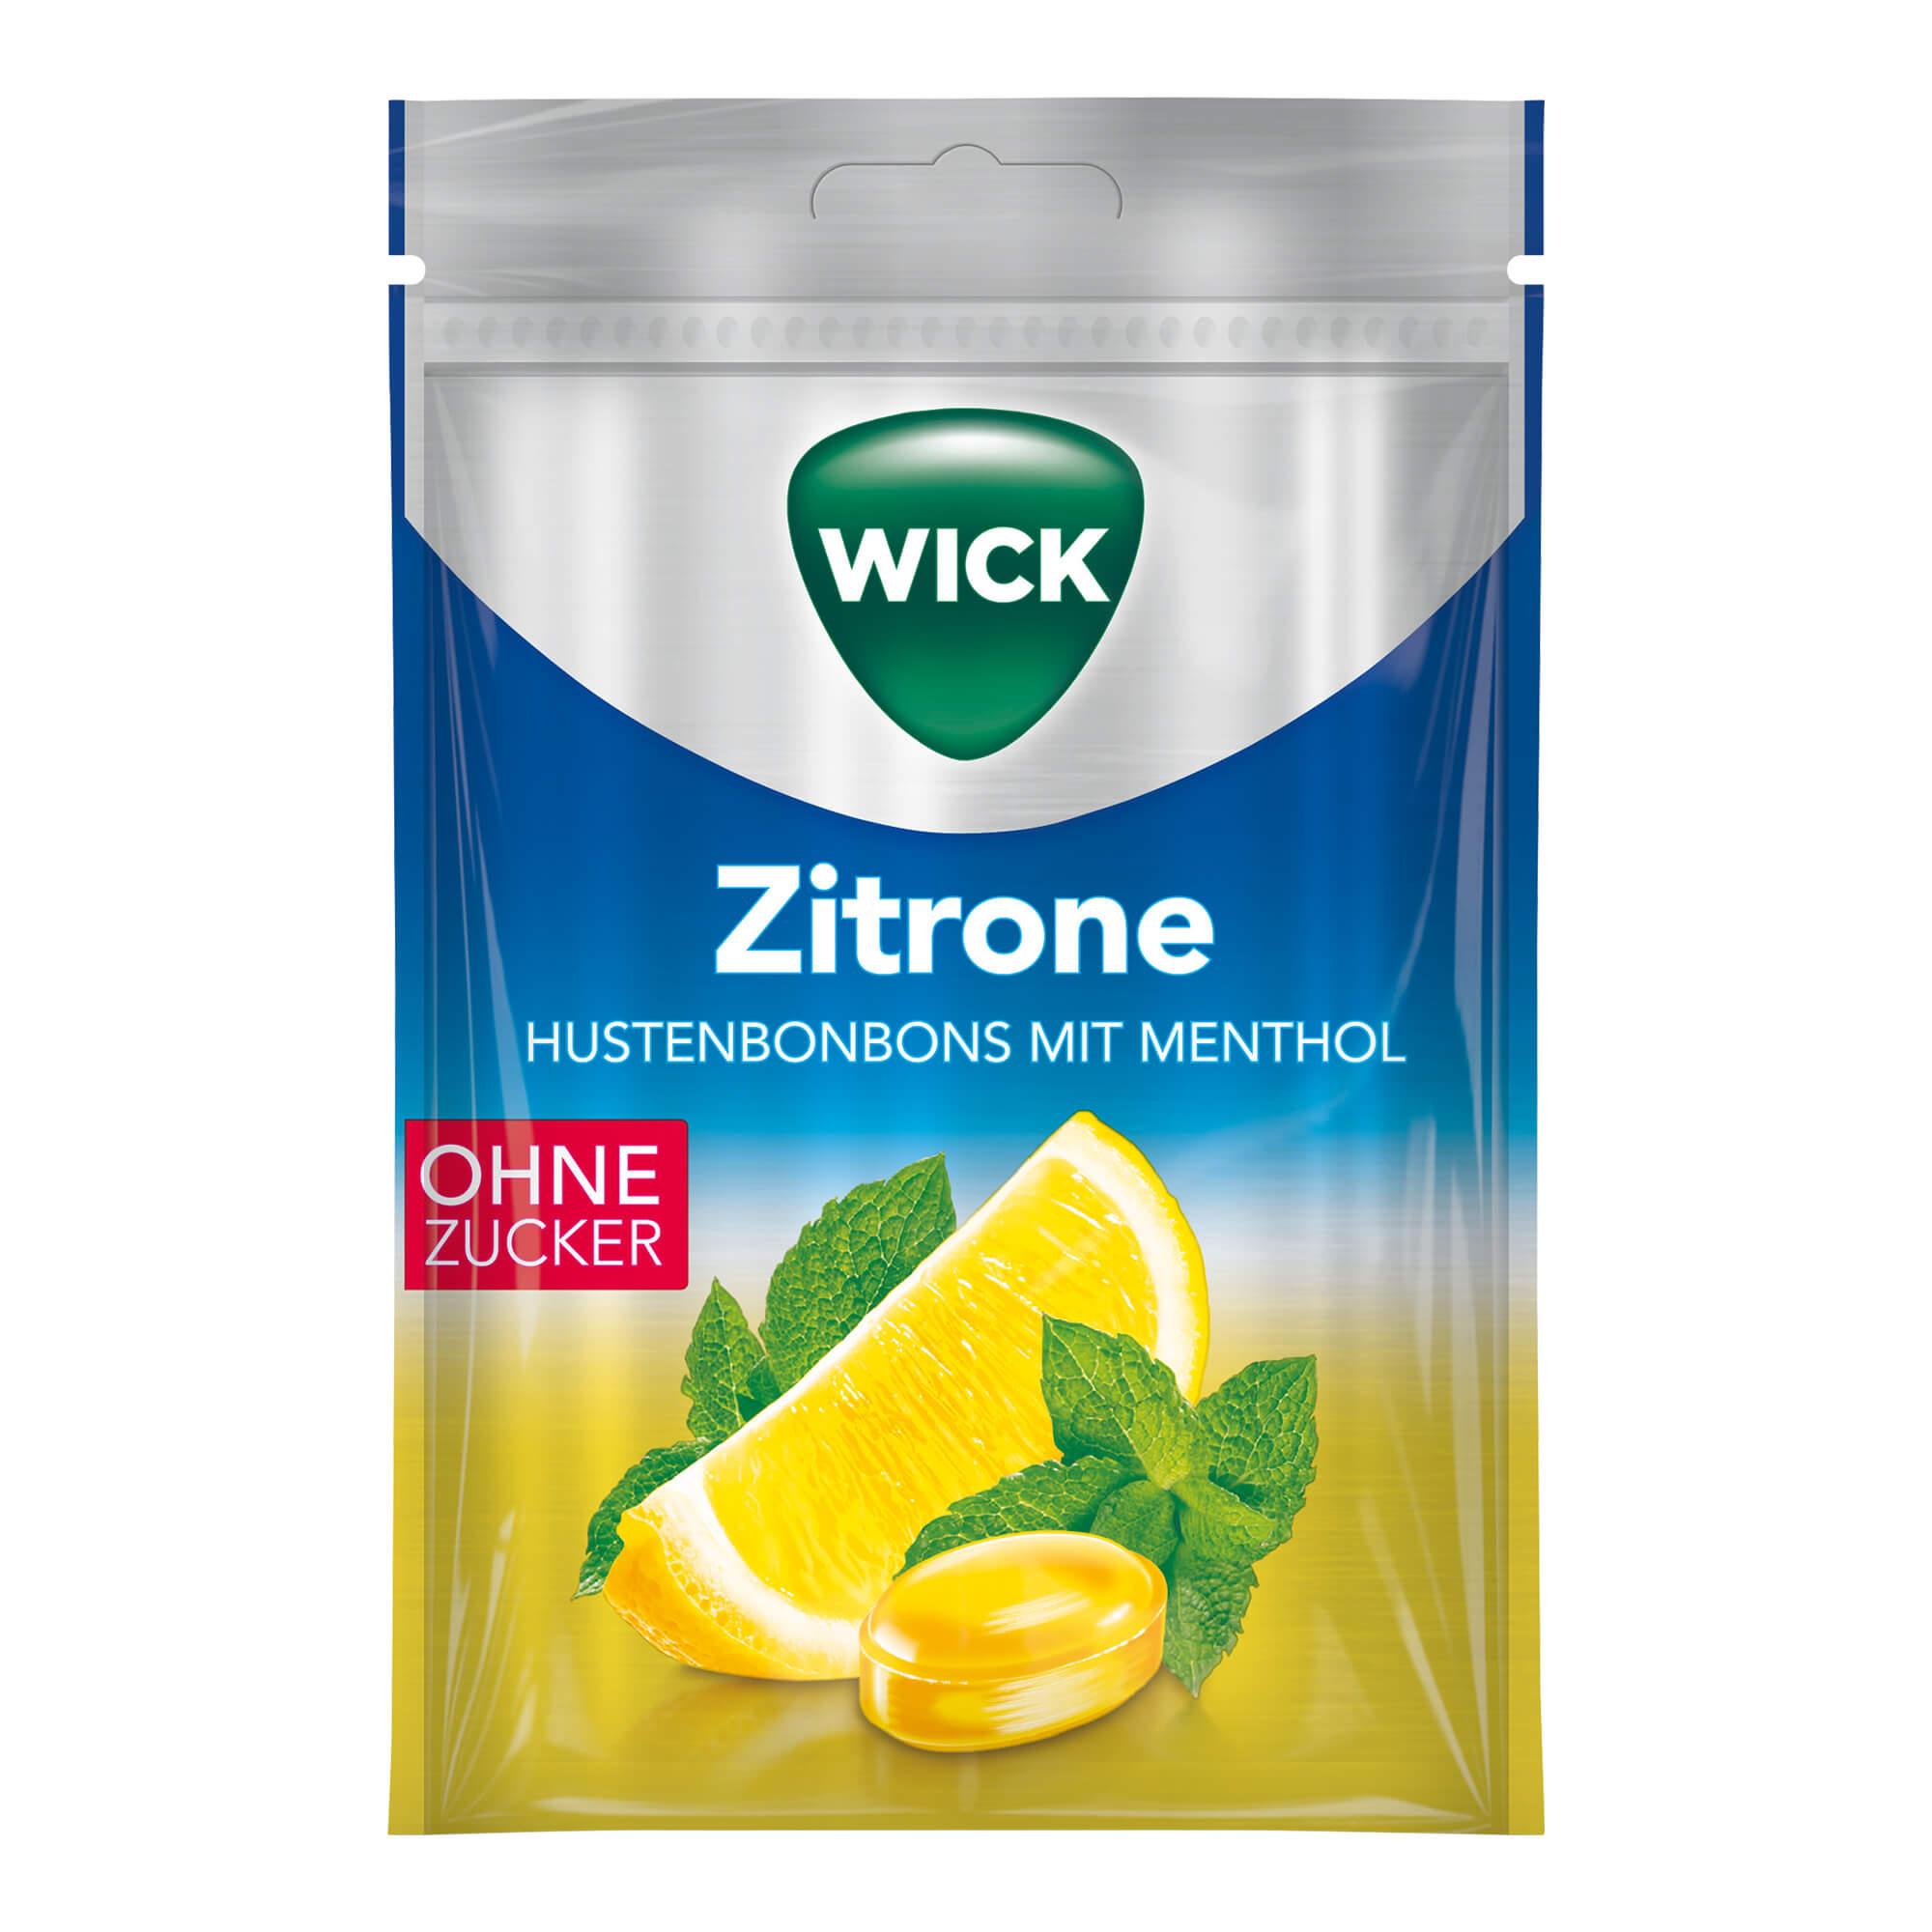 Wick Hustenbonbons Zitrone & Menthol